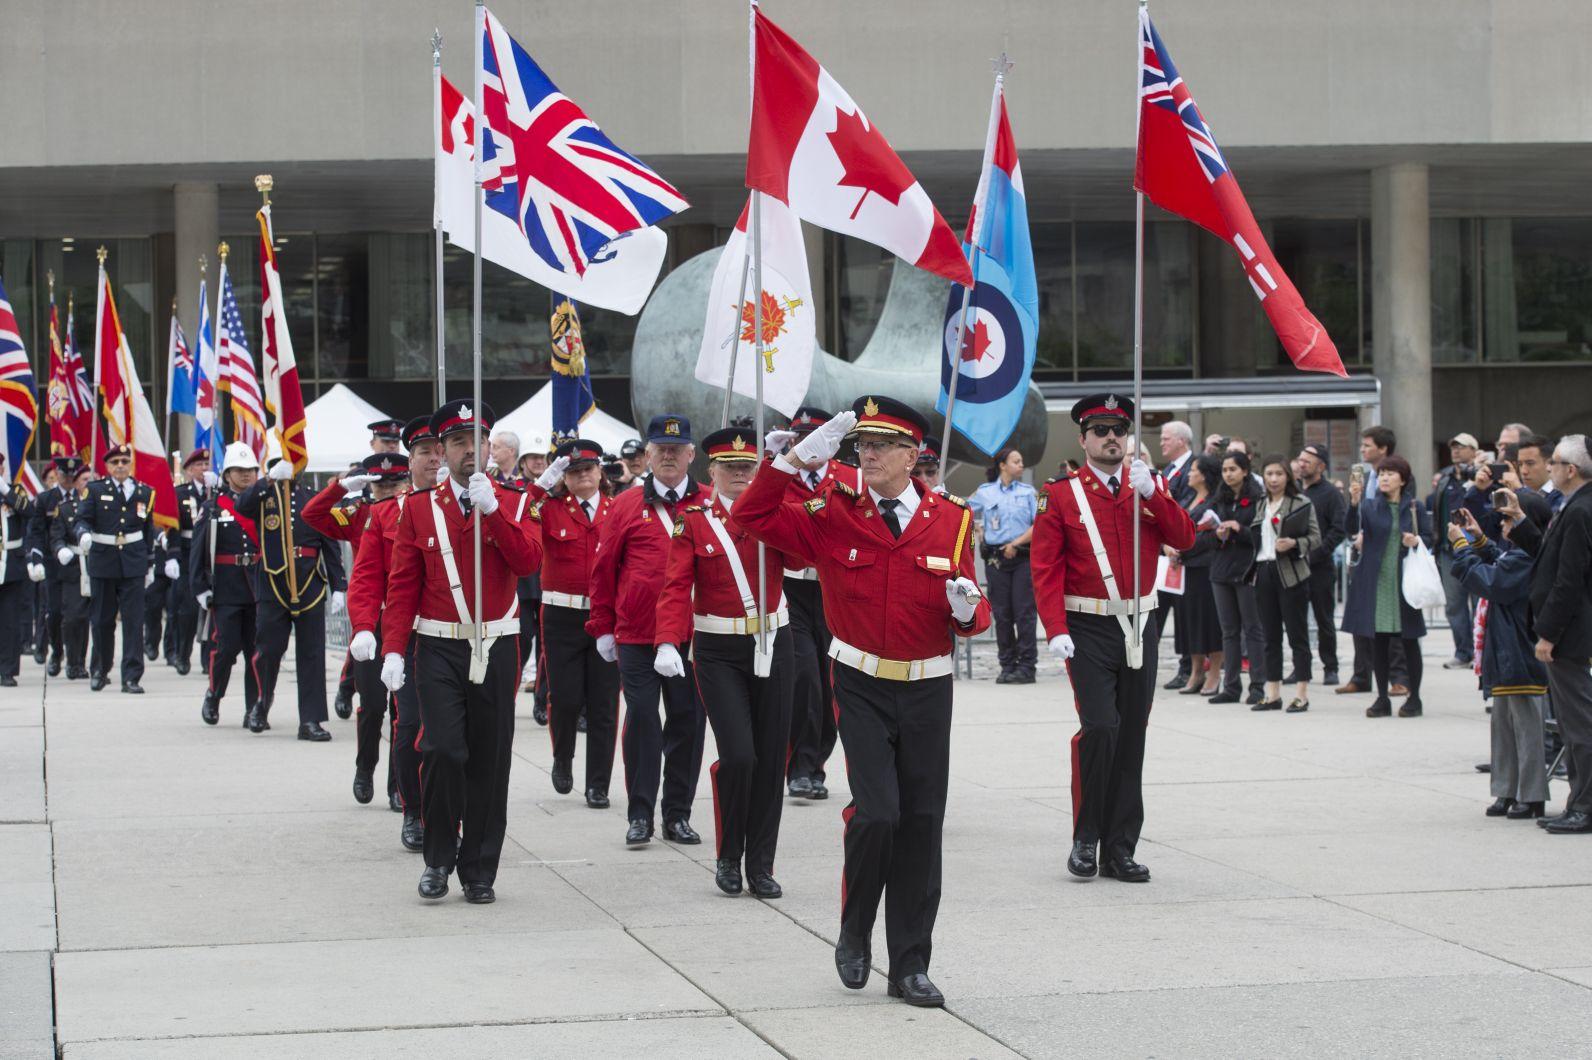 City of Toronto Honour Guard – City of Toronto